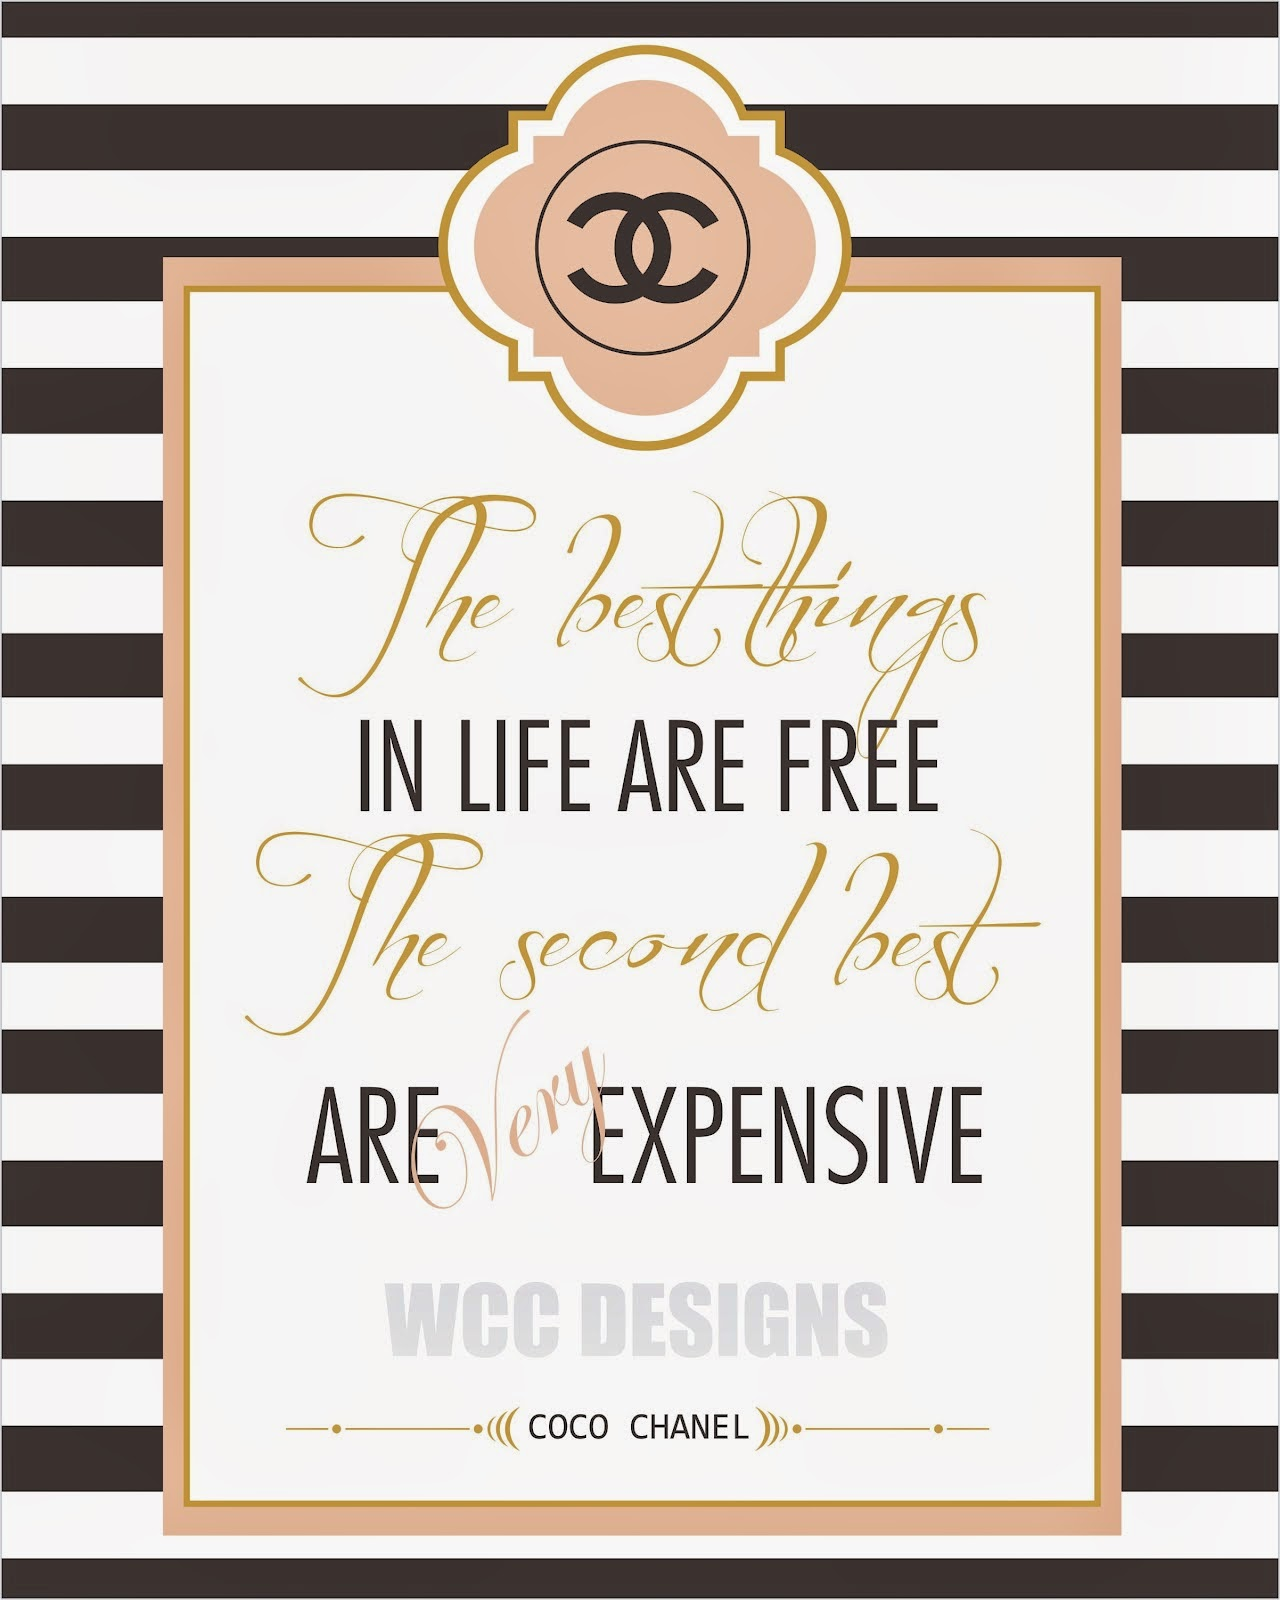 Kit De Chanel Para Imprimir Gratis Ideas Y Material